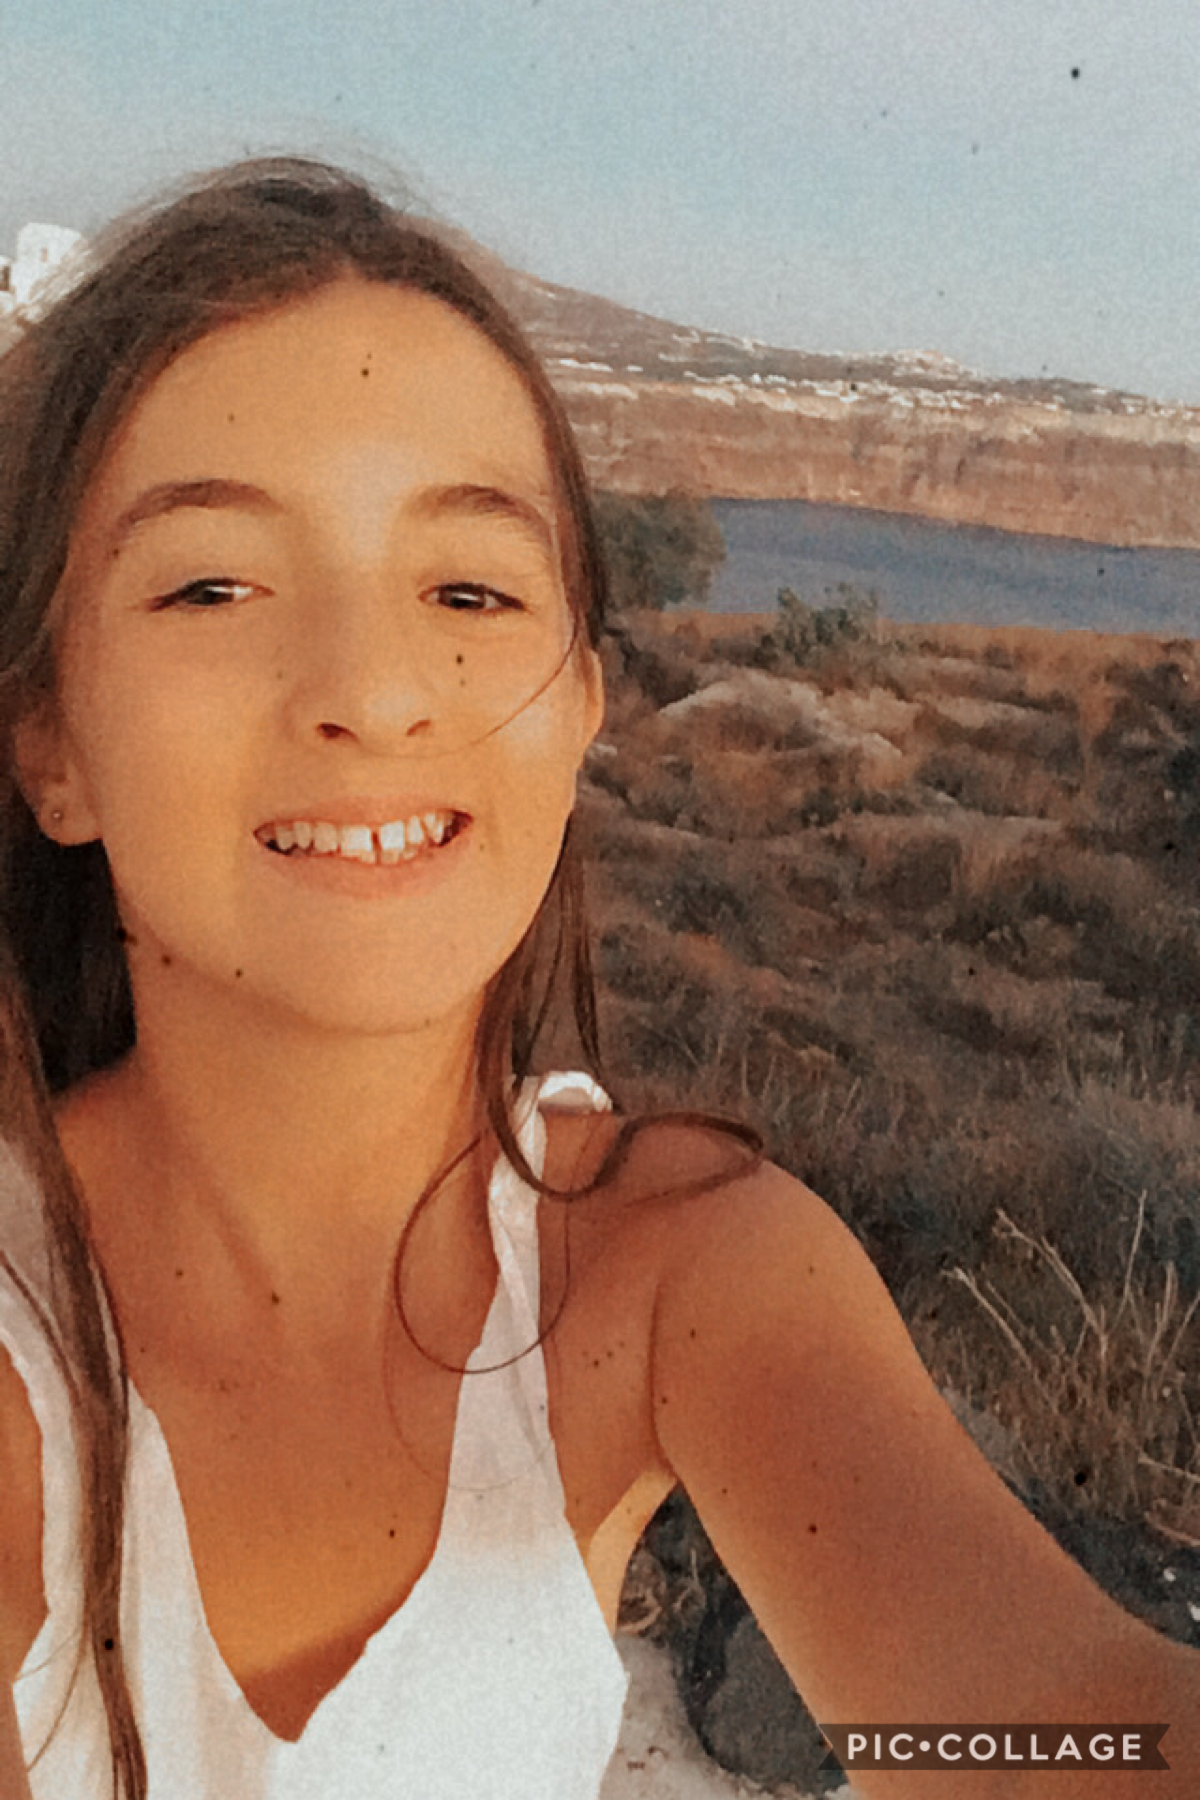 I'm in Greece teeheehee 👈🏼👉🏼😌